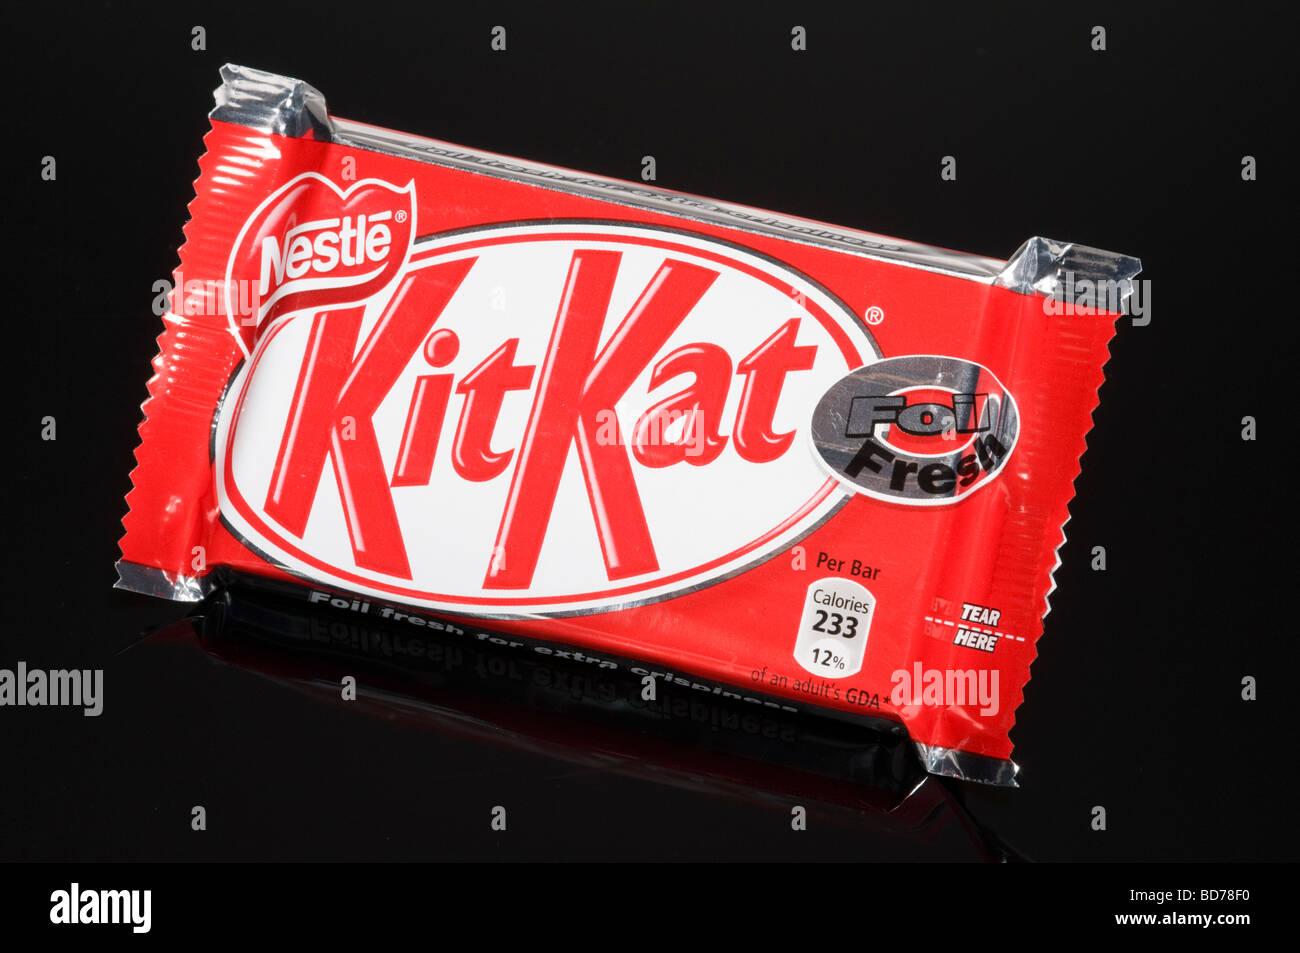 Nestle kitkat chocolate bar on black background shot in studio nestle kitkat chocolate bar on black background shot in studio voltagebd Images